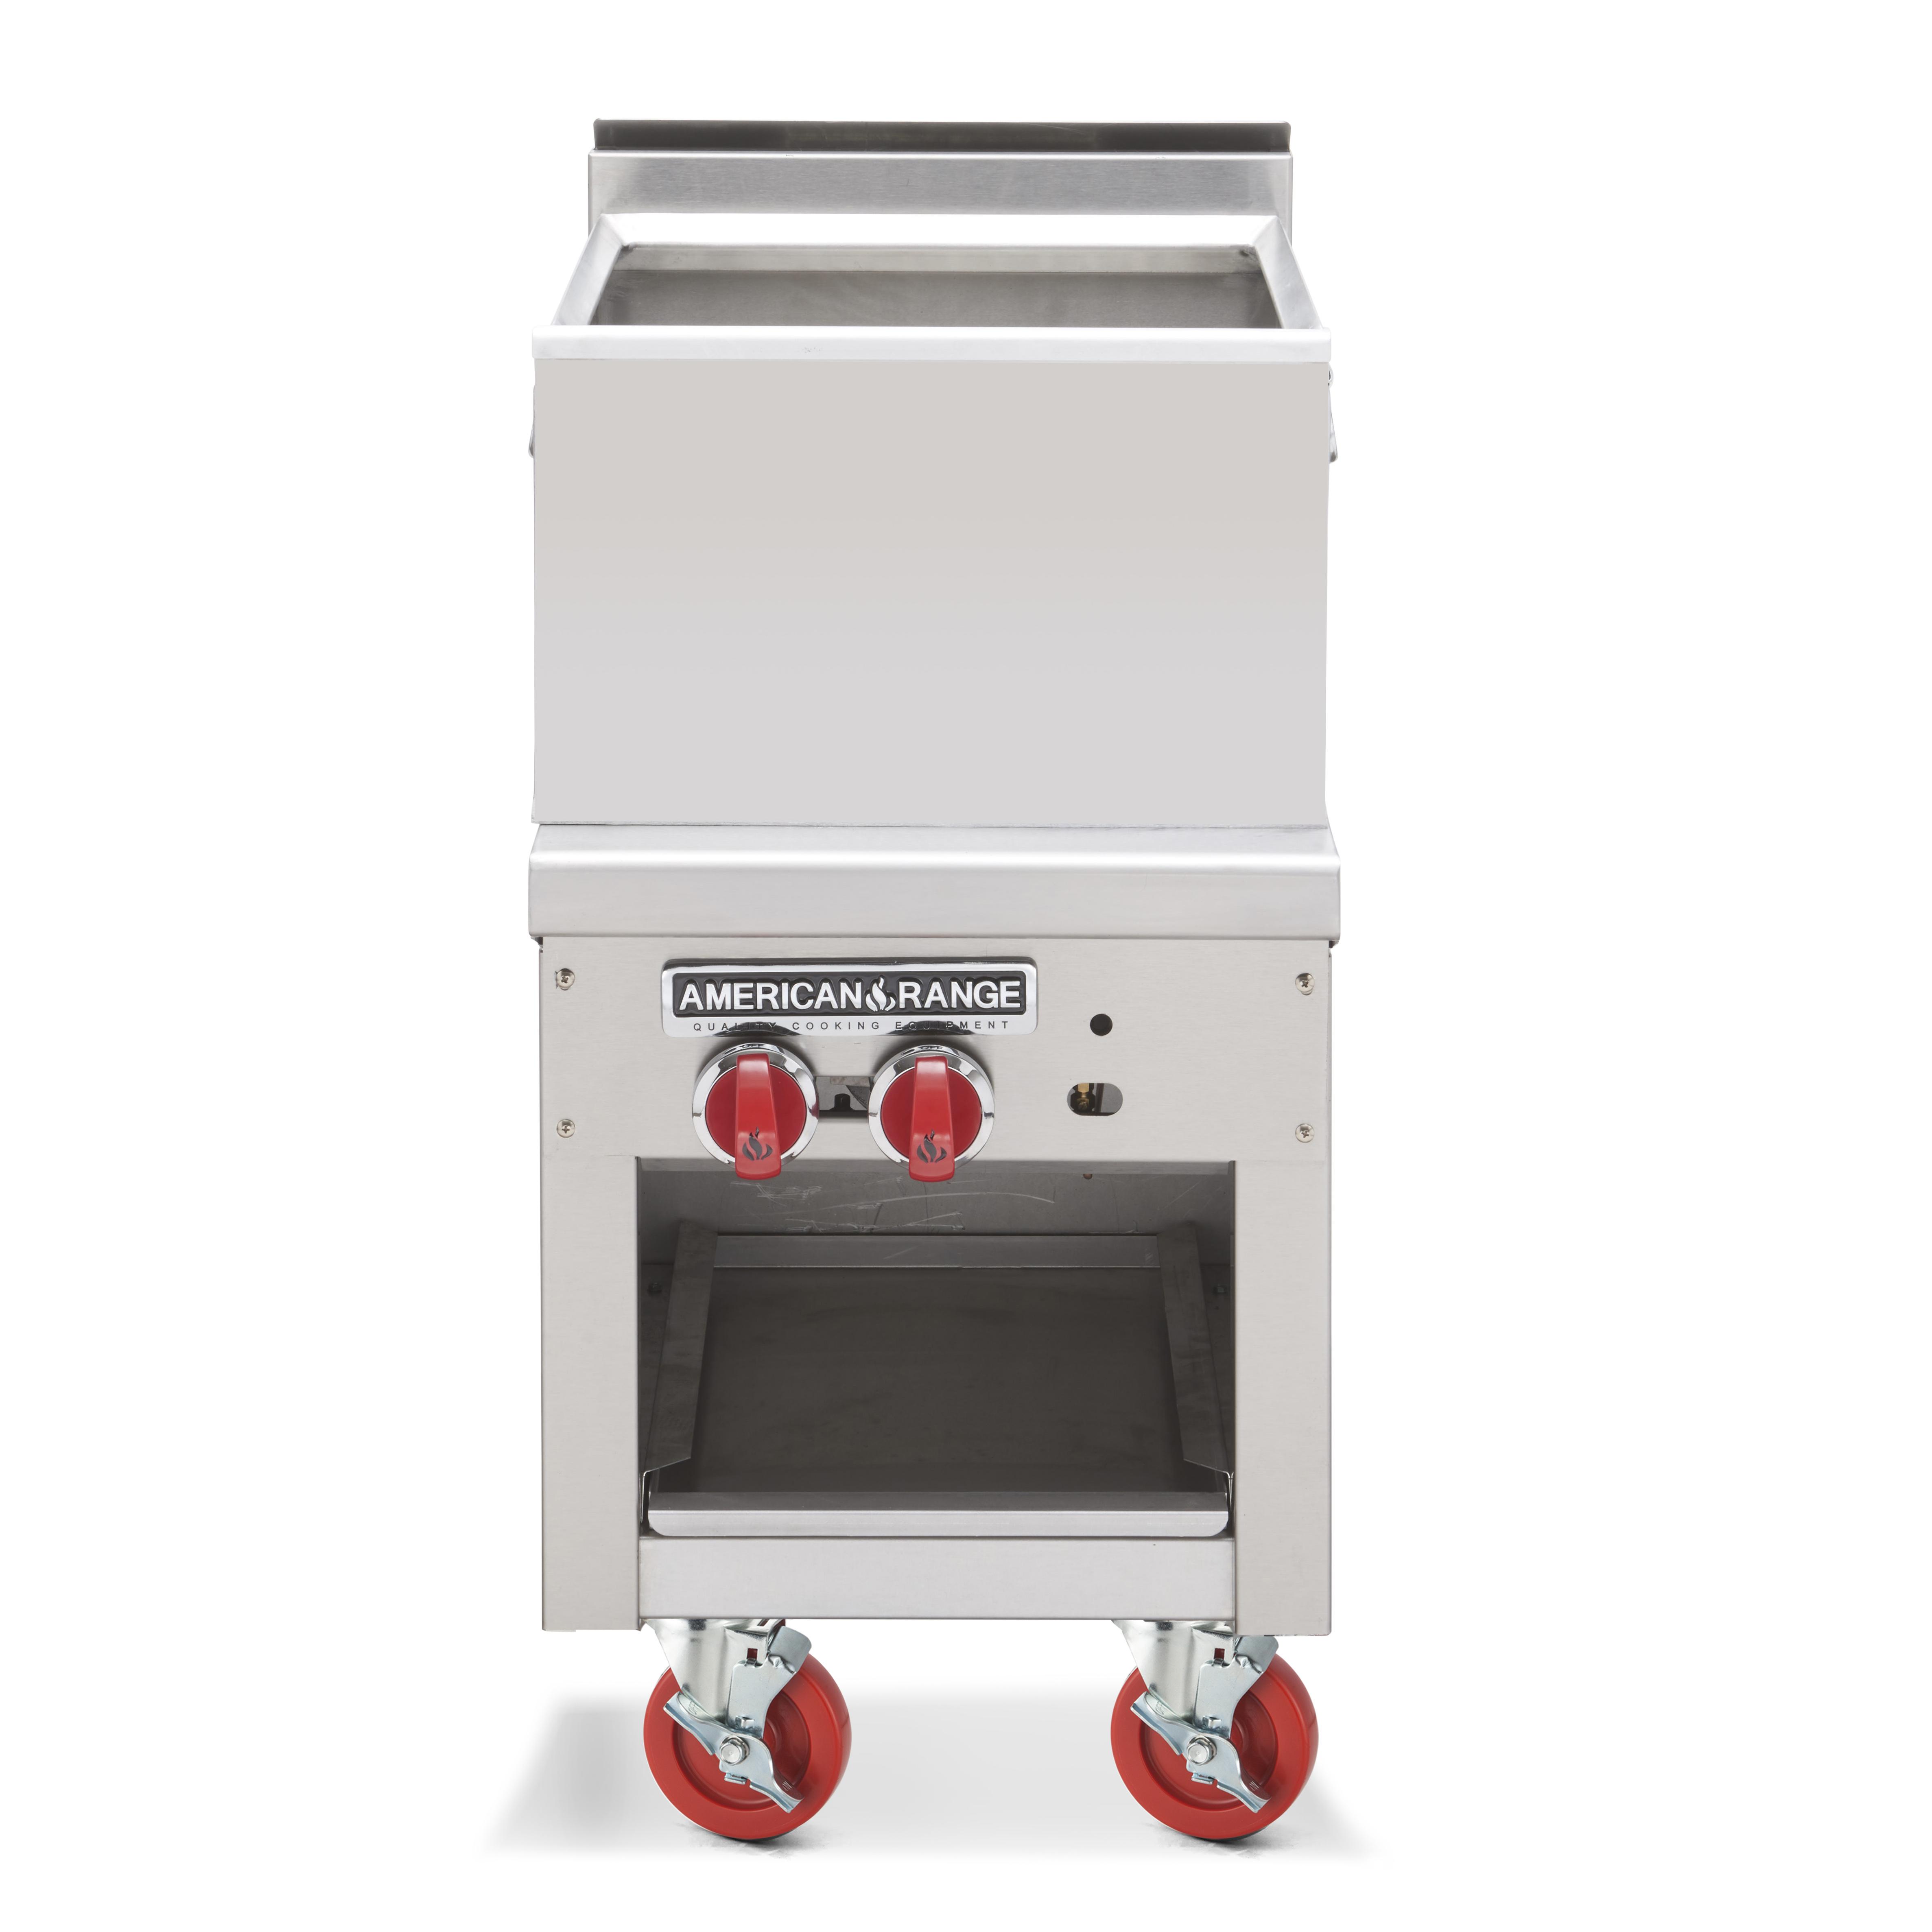 American Range ARPC-18 pasta cooker, gas